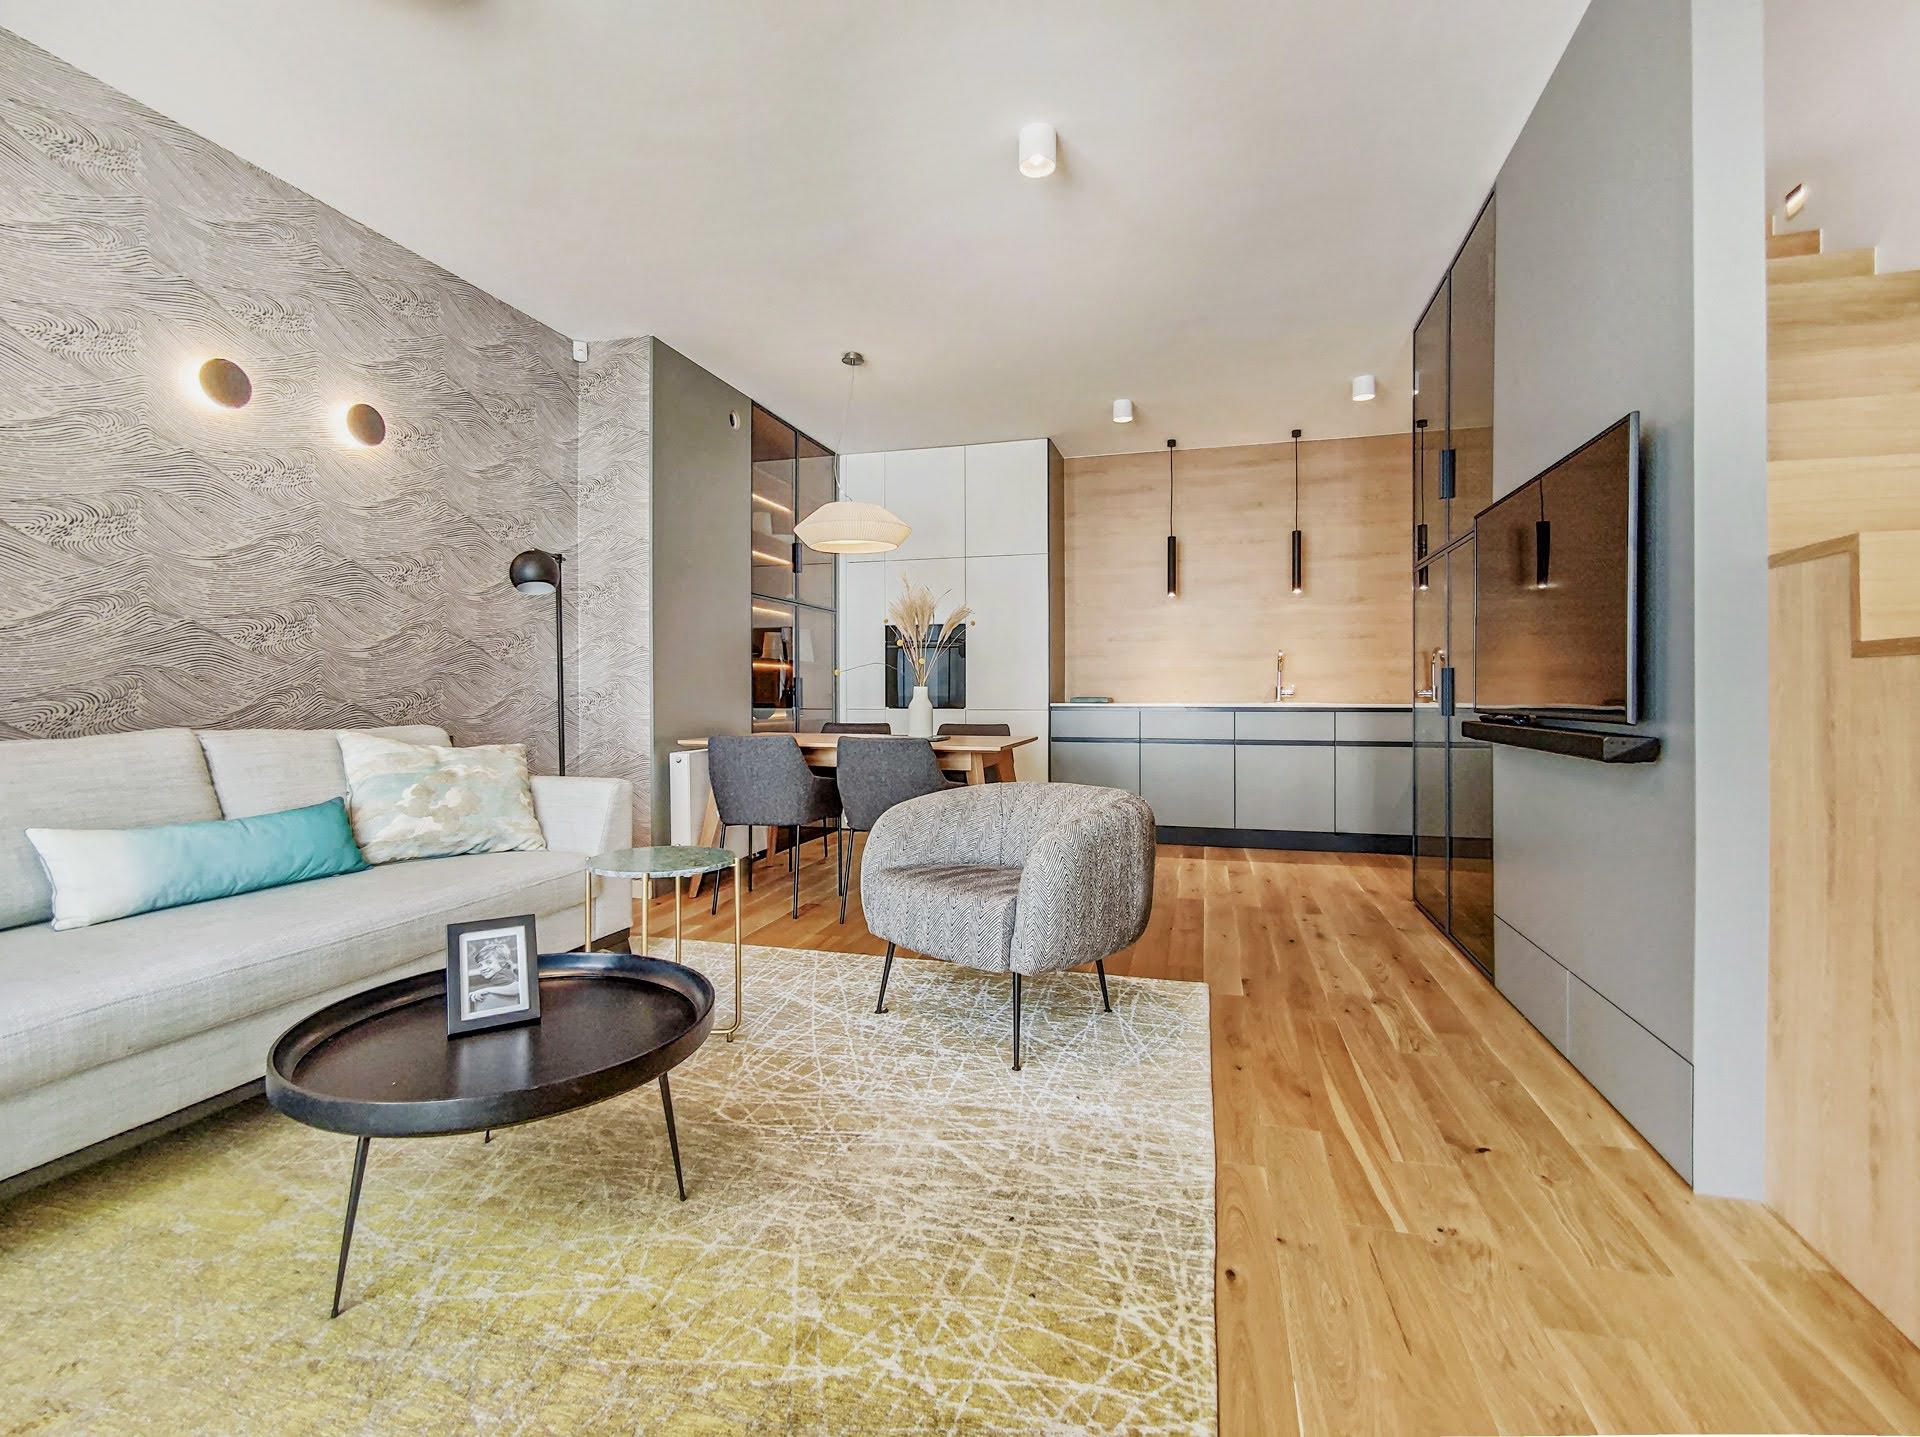 ORŁOWSKA RIWIERA - Apartament dwupoziomowy